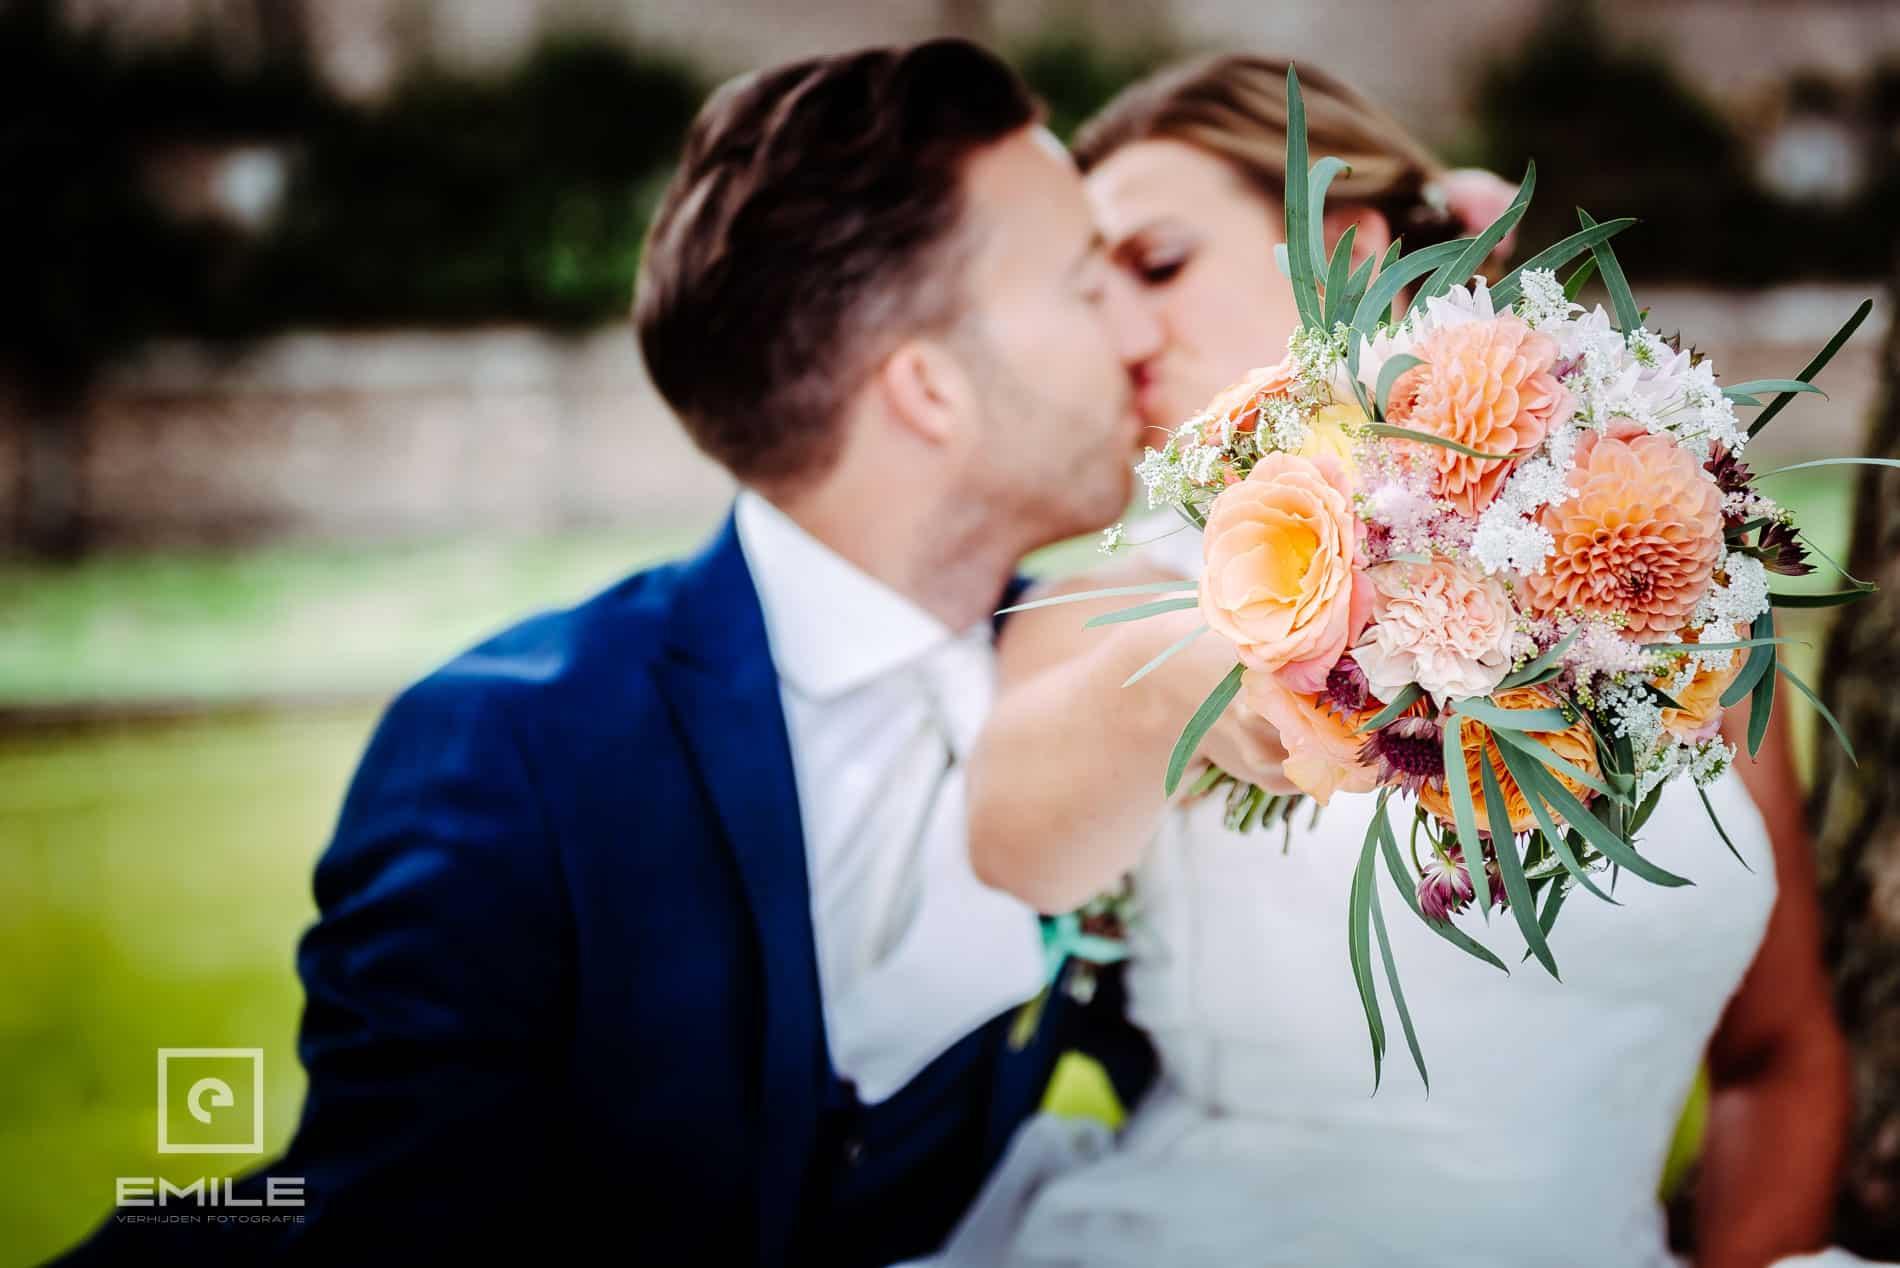 Bruidsfotograaf Kasteel Limbricht - kus met boeket